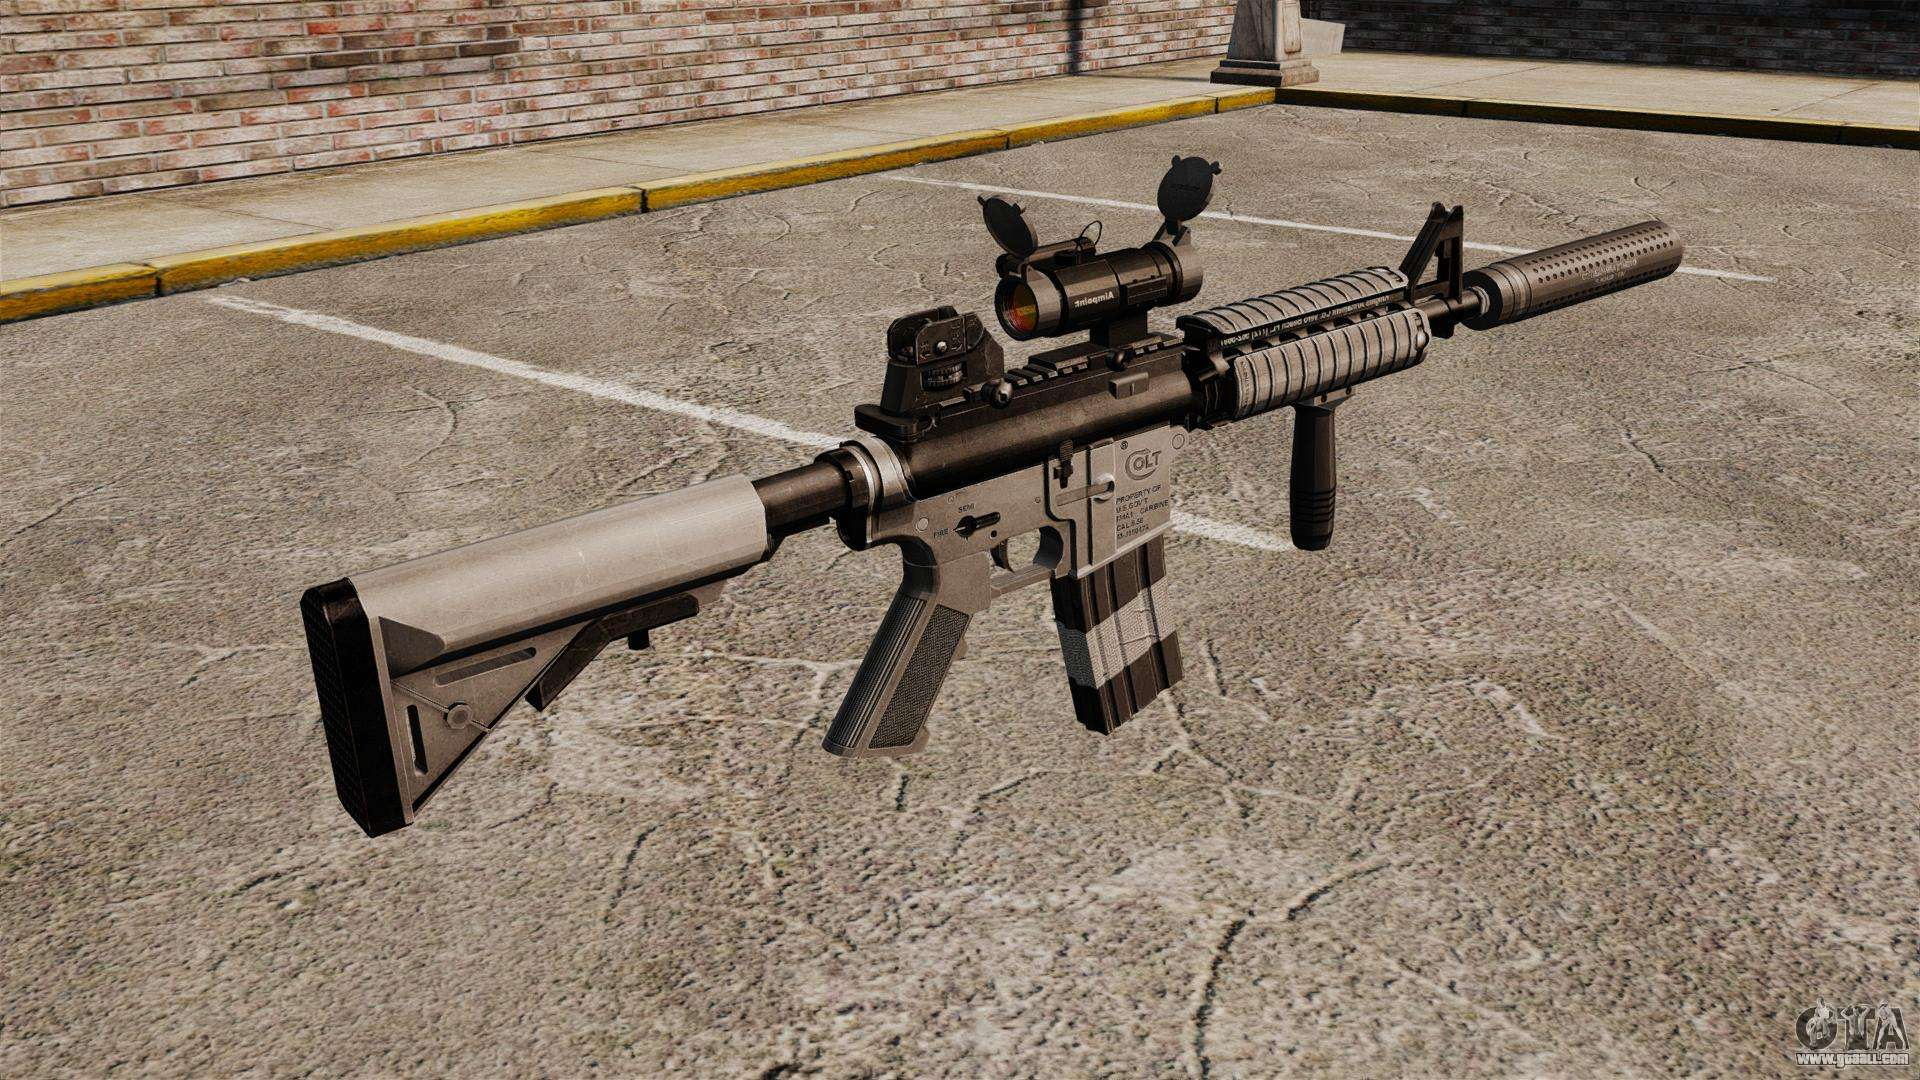 Carbine Silencer m4 Carbine With Silencer v2